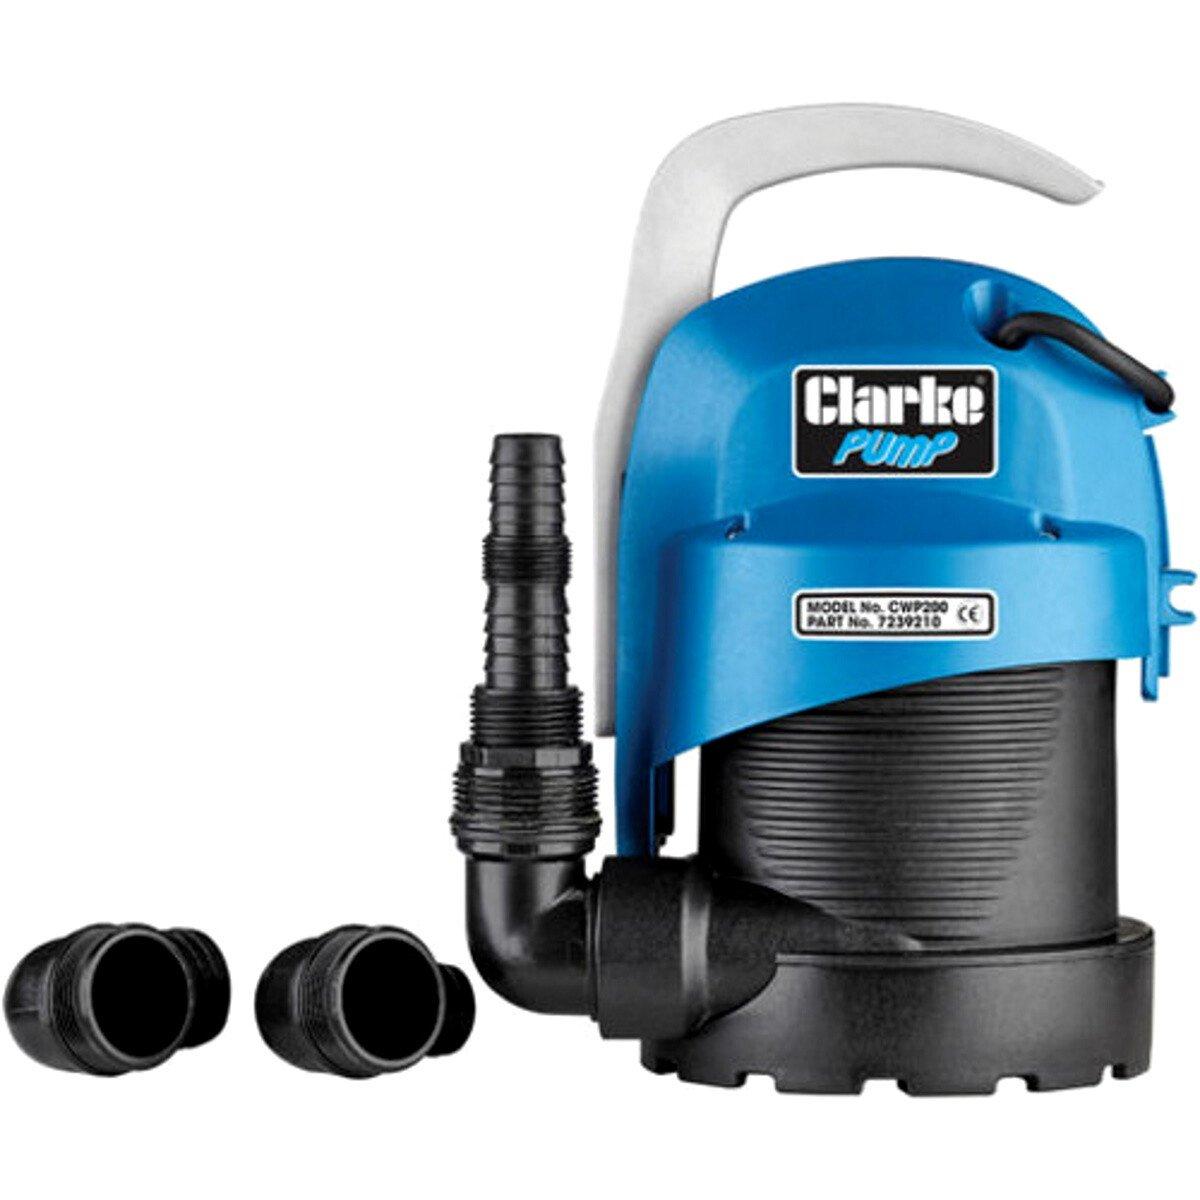 "Clarke CWP200 1¼"" 220W 95Lpm 5.5m Head Clean Water Submersible 230V 7239210"